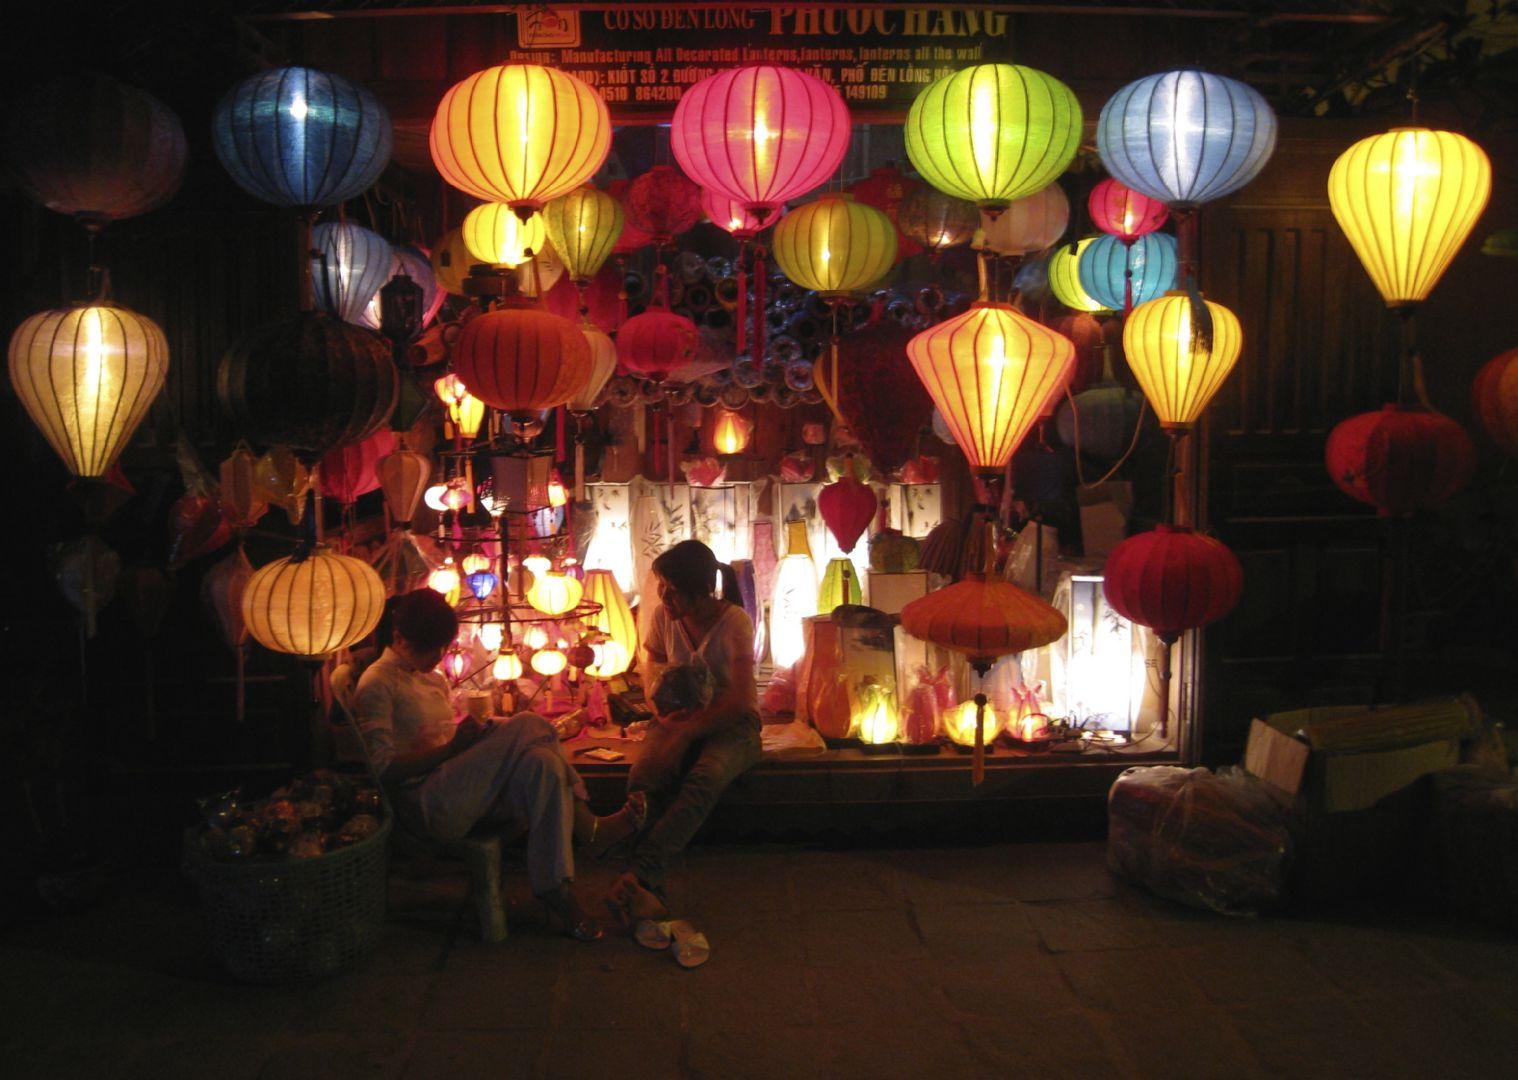 Vietnam 2008 (254).jpg - Laos - Hidden Treasures - Cycling Adventures